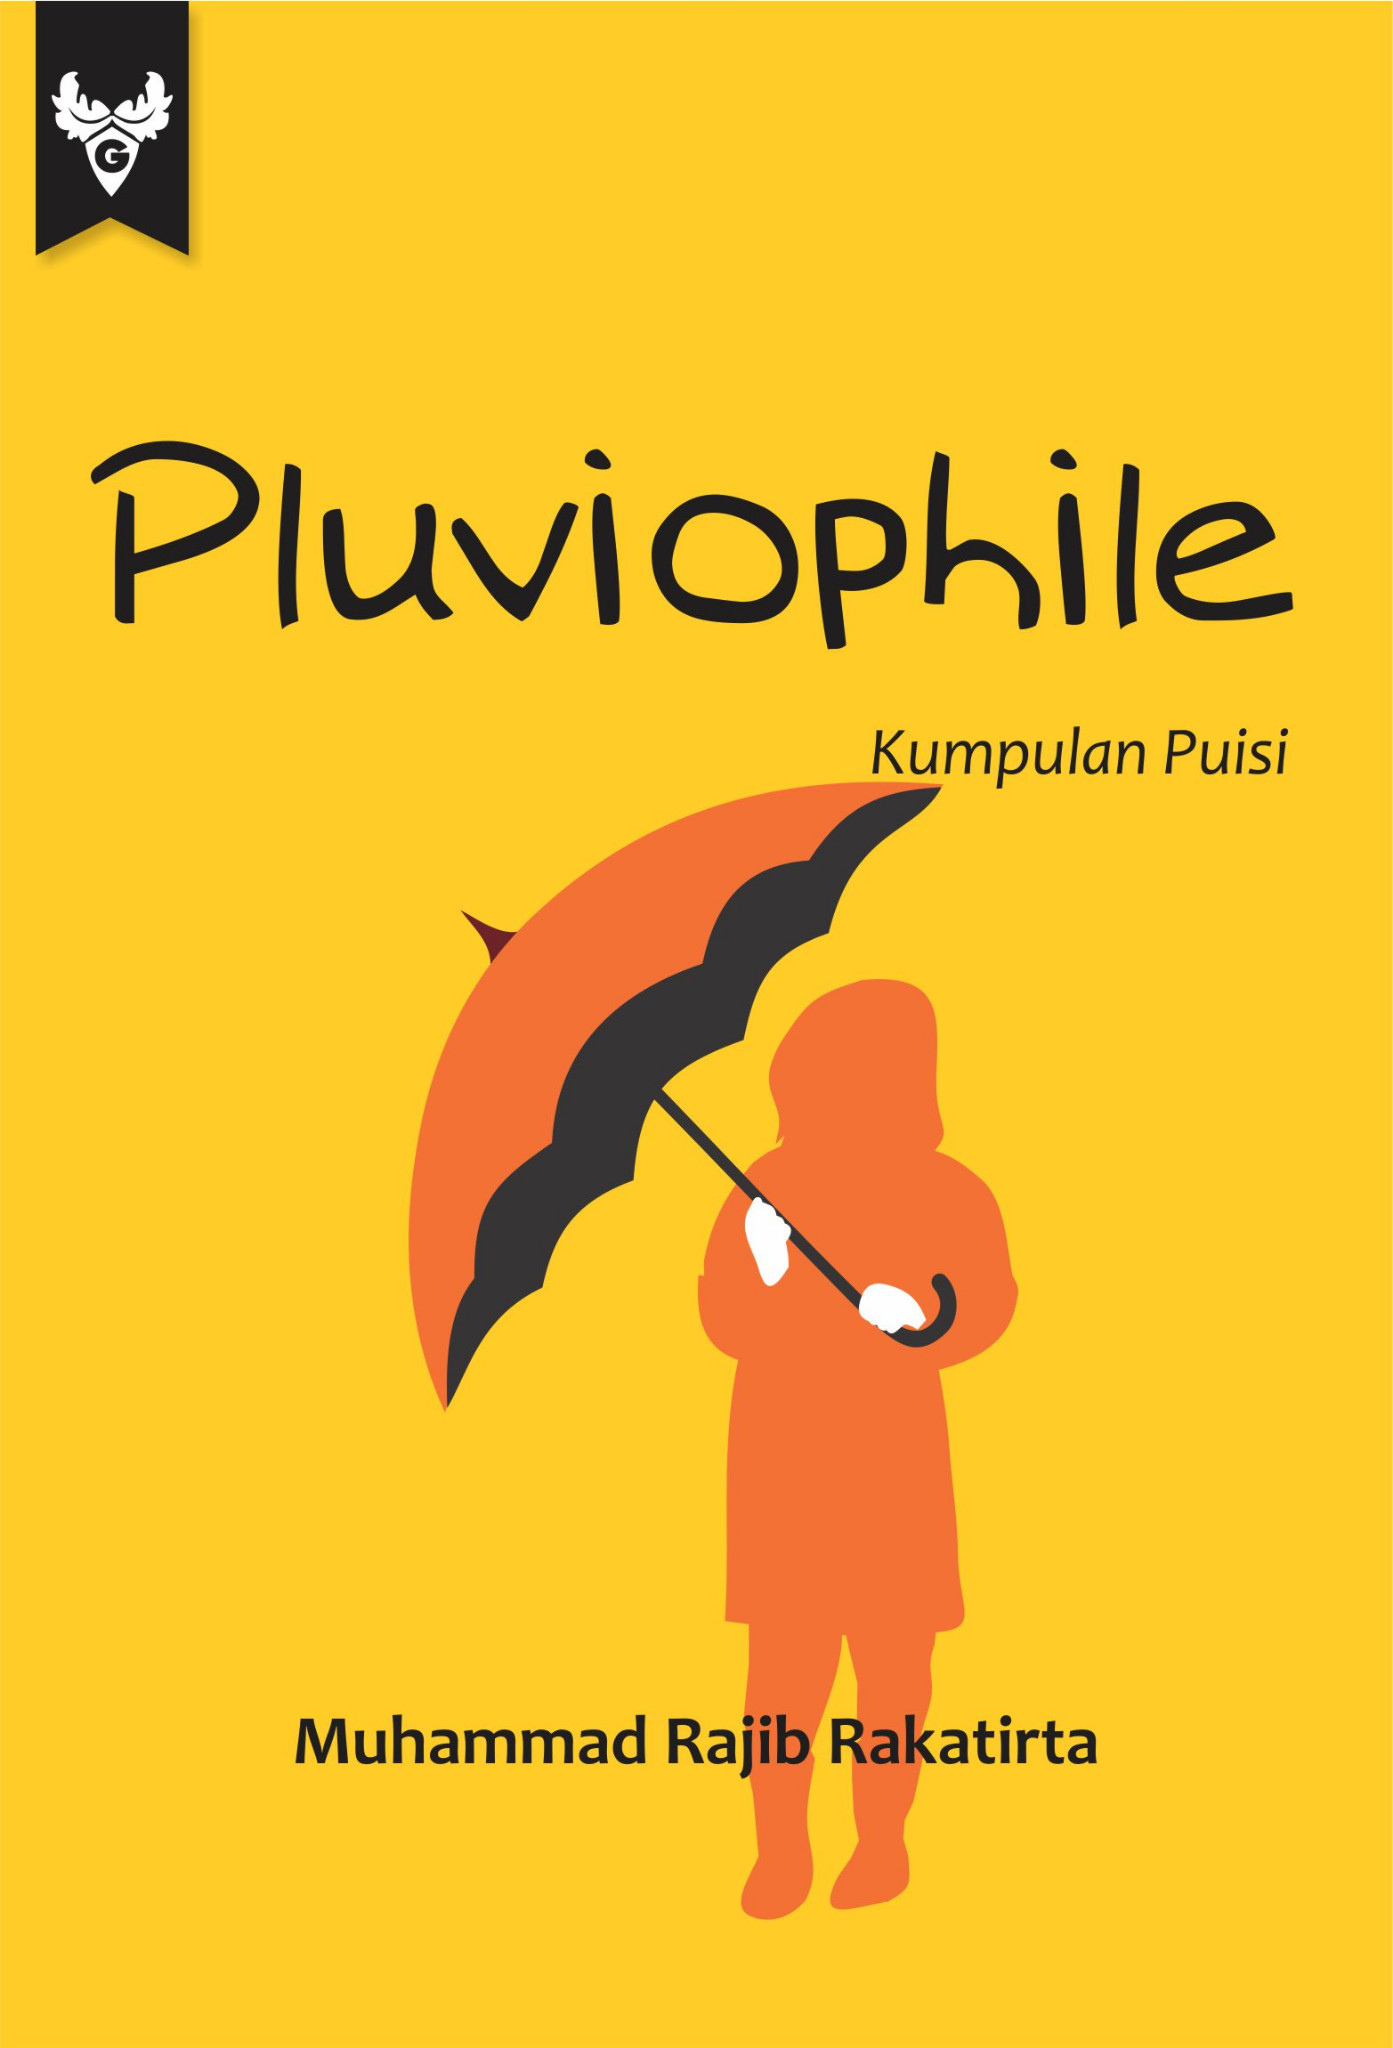 Pluviophile (Kumpulan Puisi) - Blanja.com